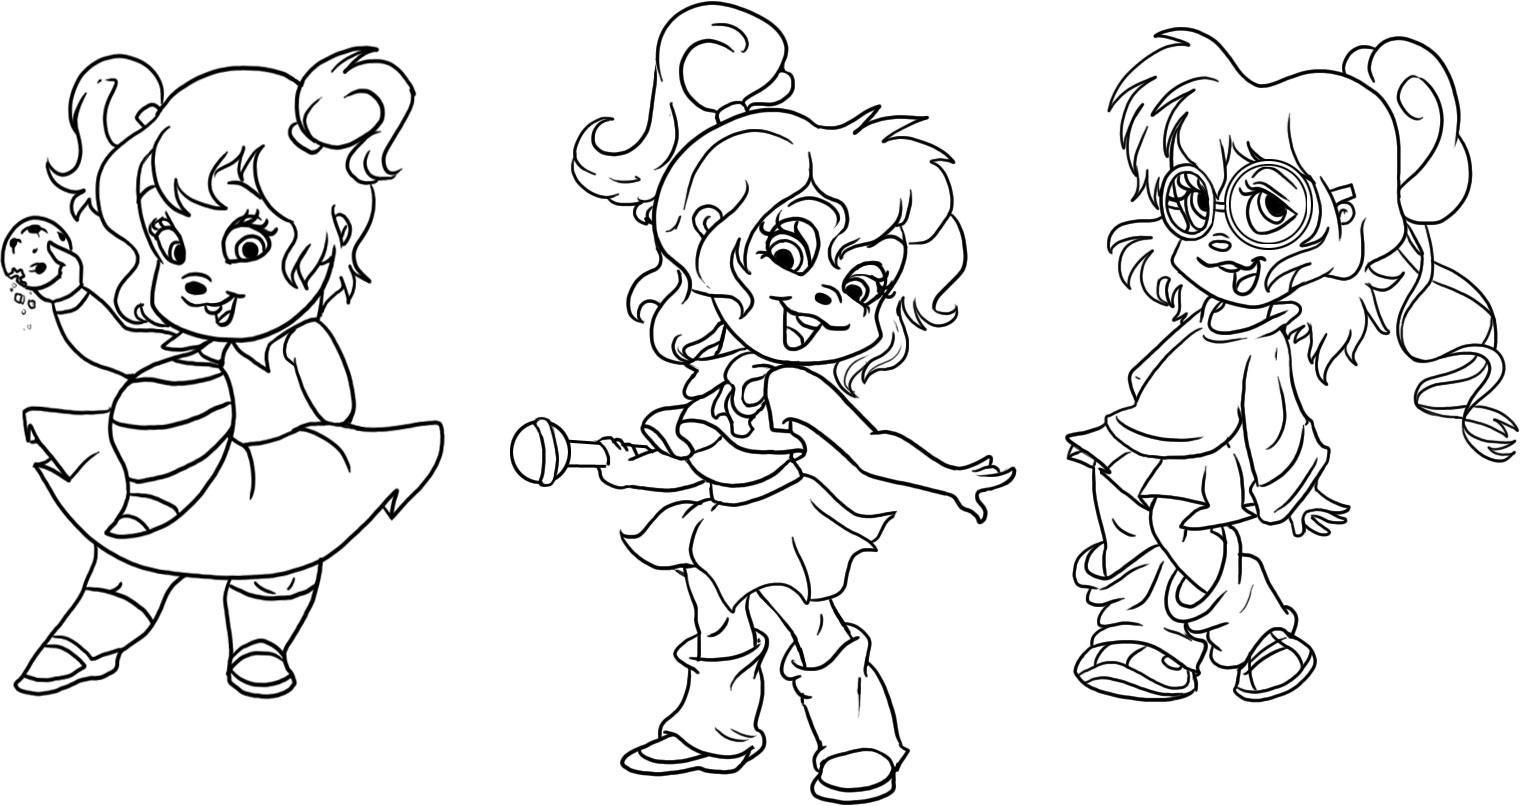 Vriendinnetje Alvin Cartoon Coloring Pages Coloring Pages Coloring Pages For Kids